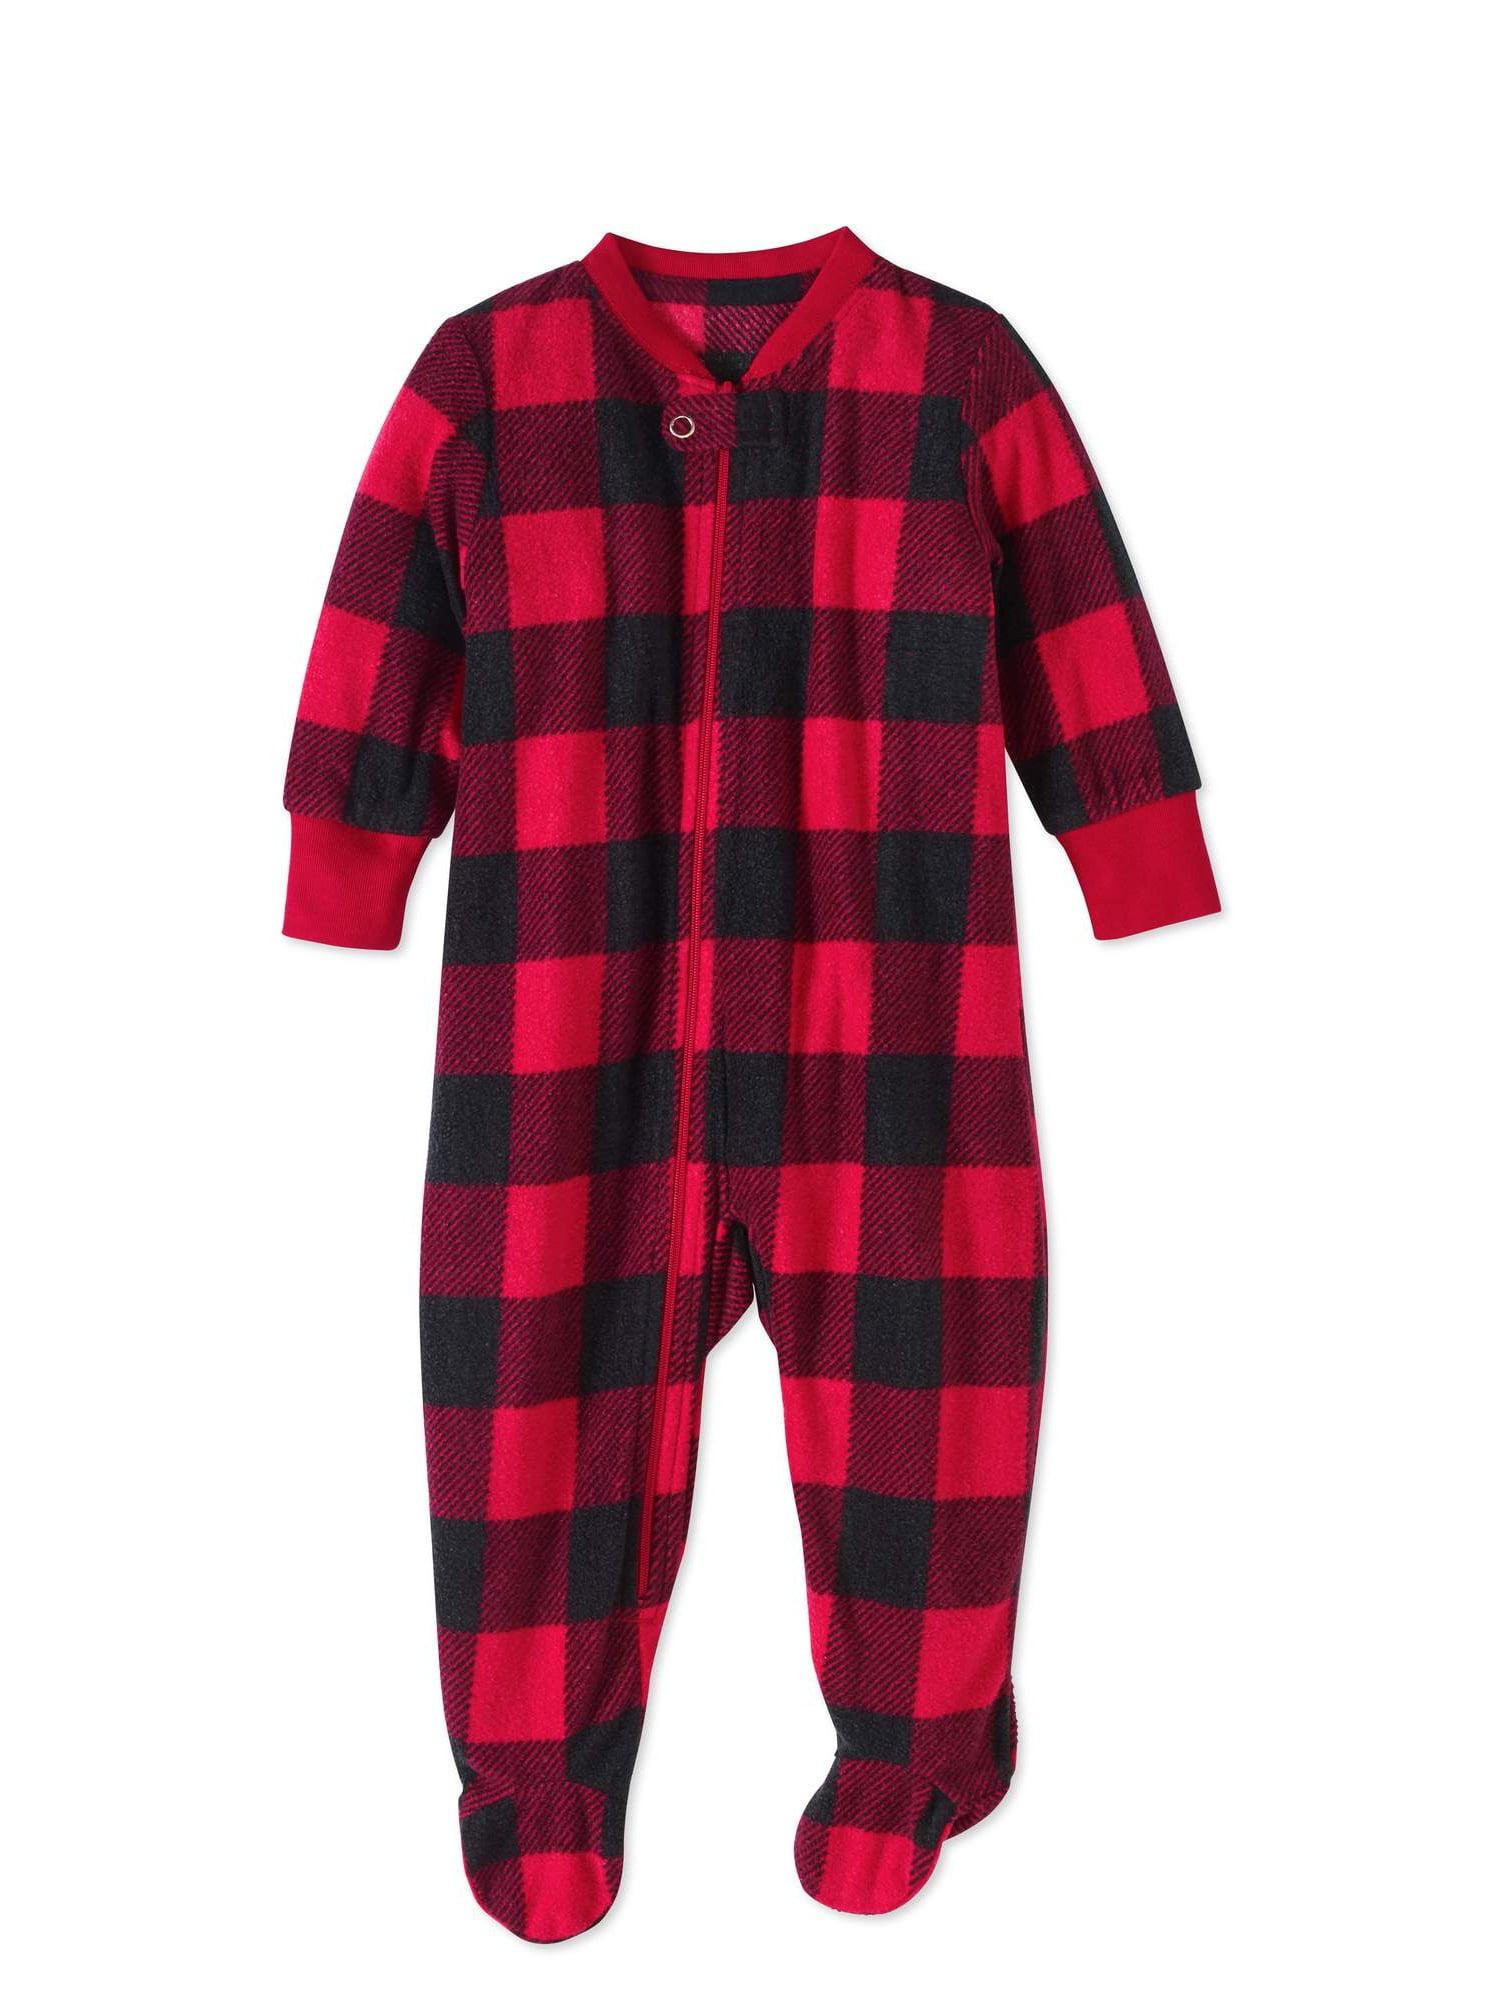 201f79d2af HOLIDAY - Family Pajamas Newborn Baby Unisex Buffalo Check Footed Blanket  Sleeper - Walmart.com